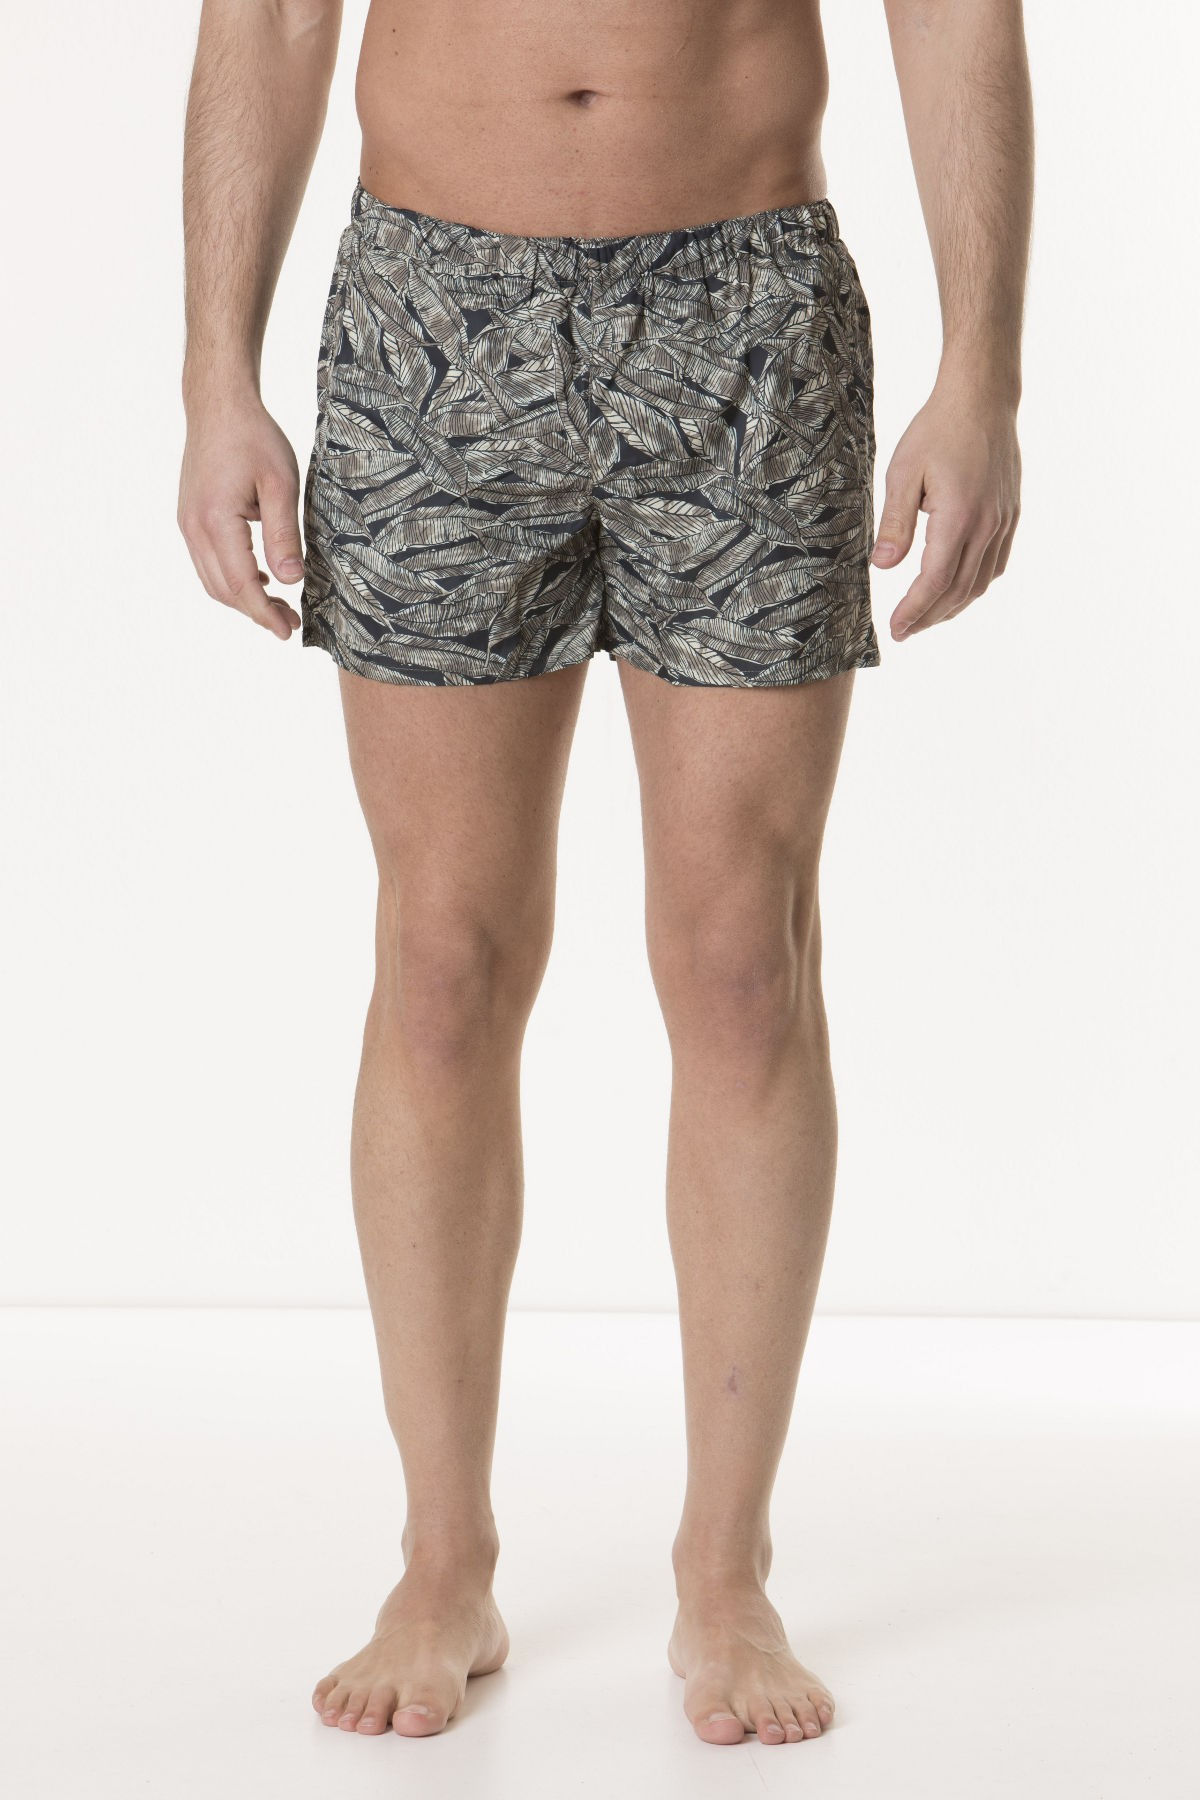 f633665621 Swimsuit for man ANTONY MORATO S/S 18 - Rione Fontana